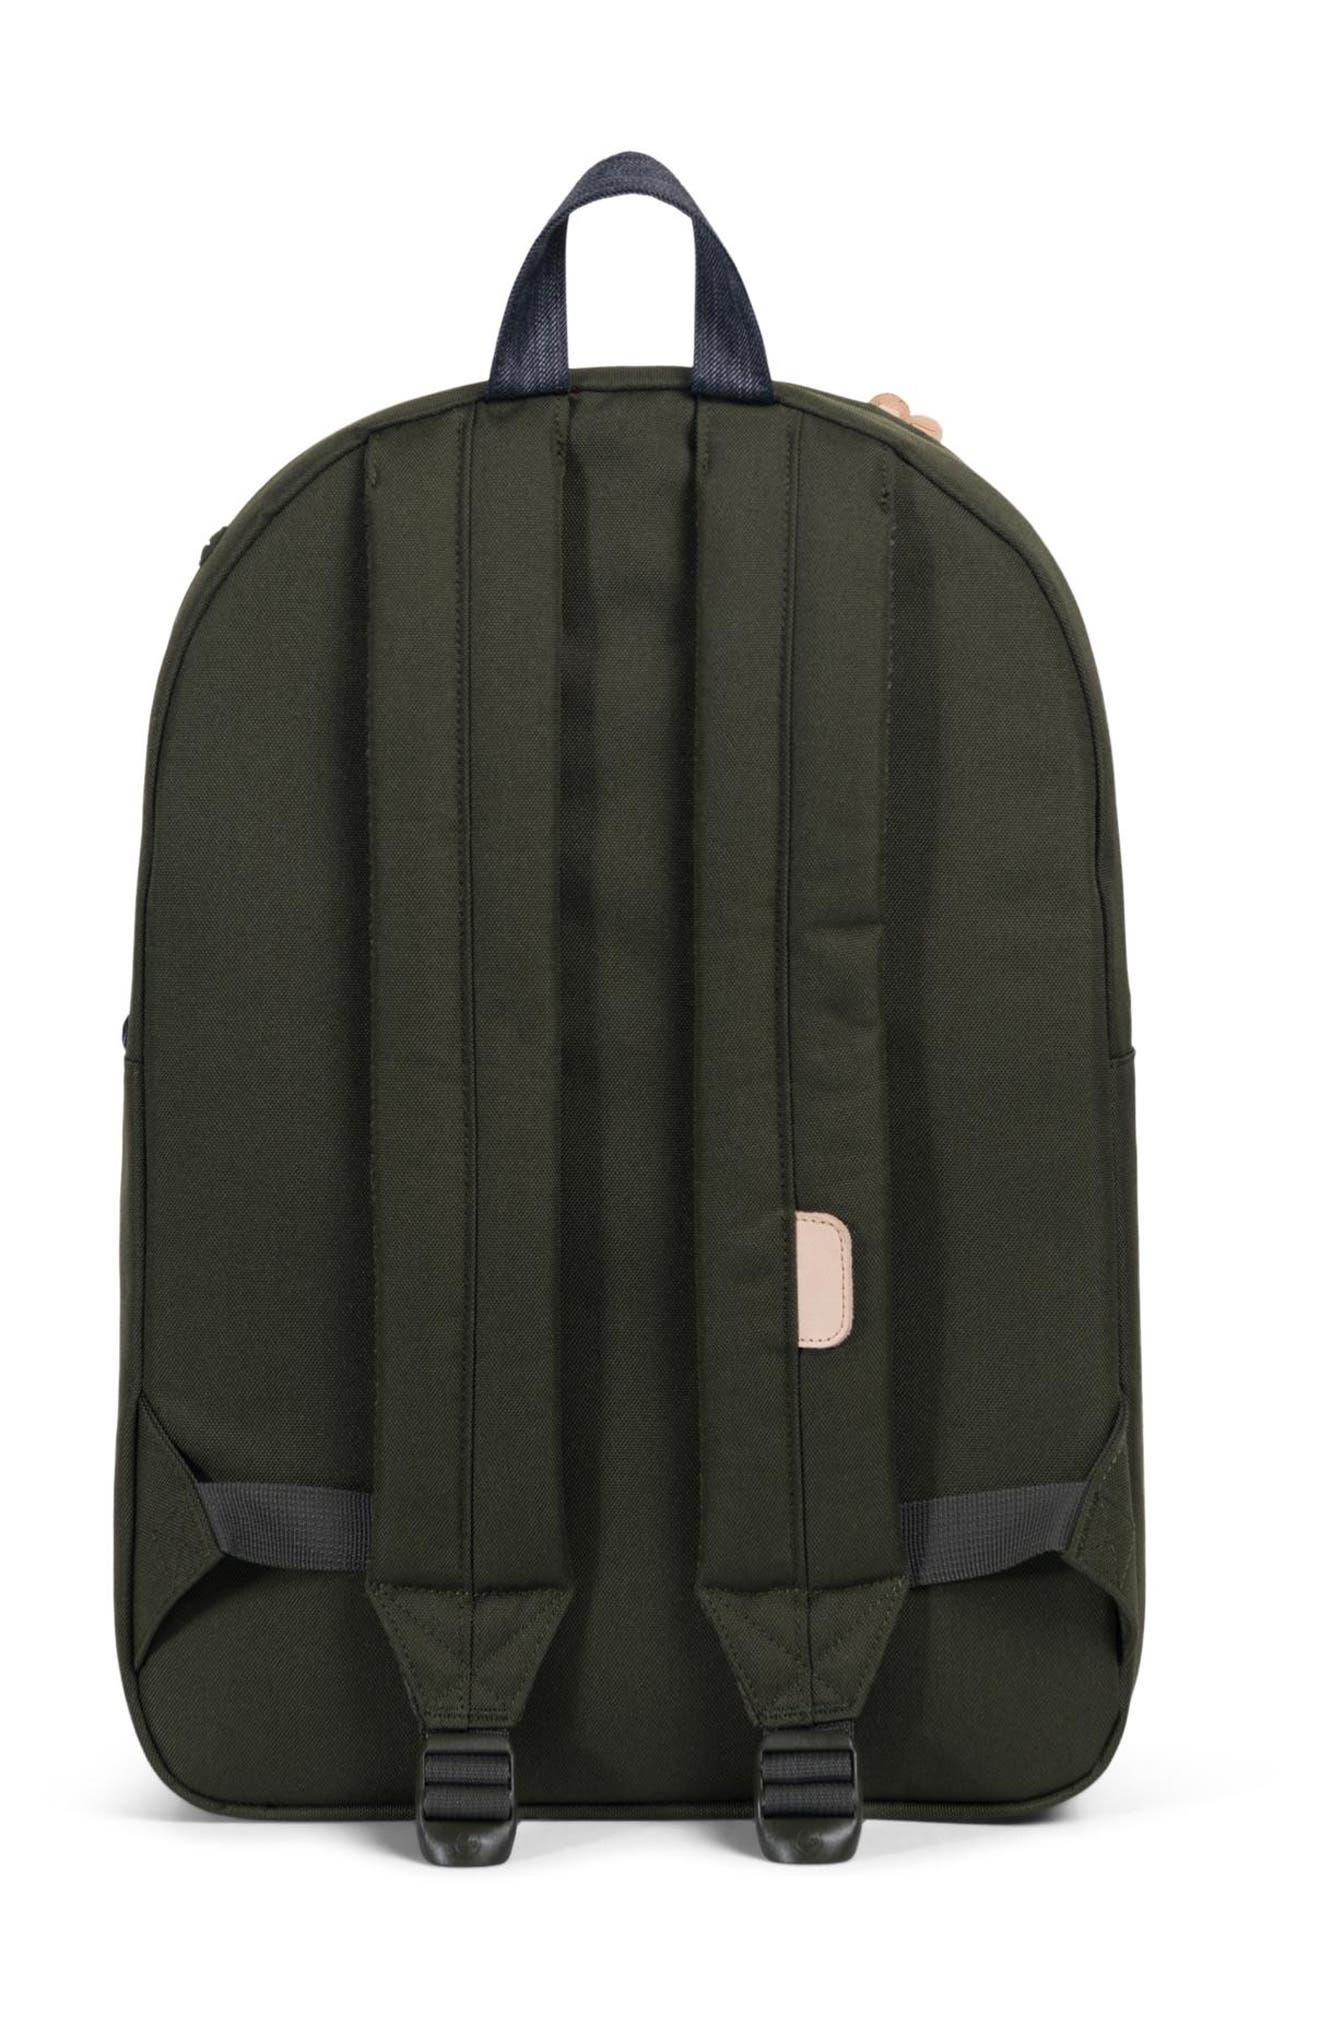 Heritage Offset Denim Backpack,                             Alternate thumbnail 2, color,                             FOREST NIGHT/ DARK DENIM